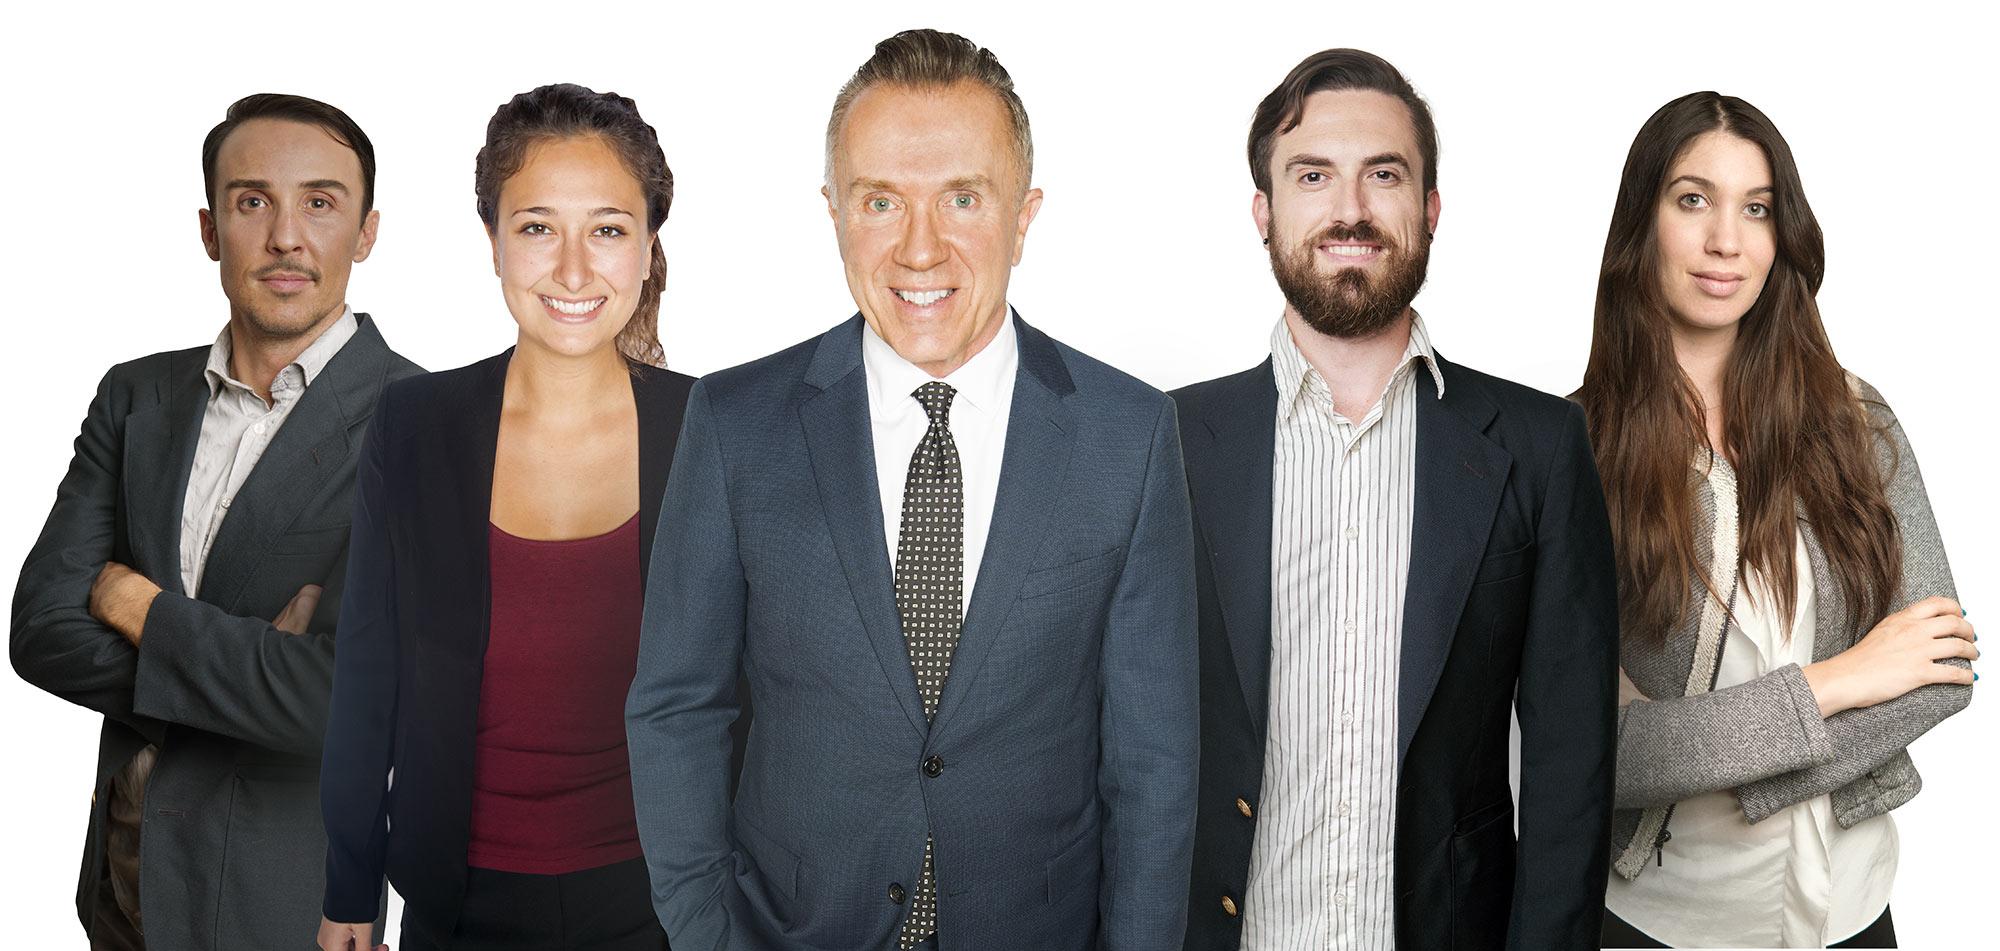 Jury Pickers Team